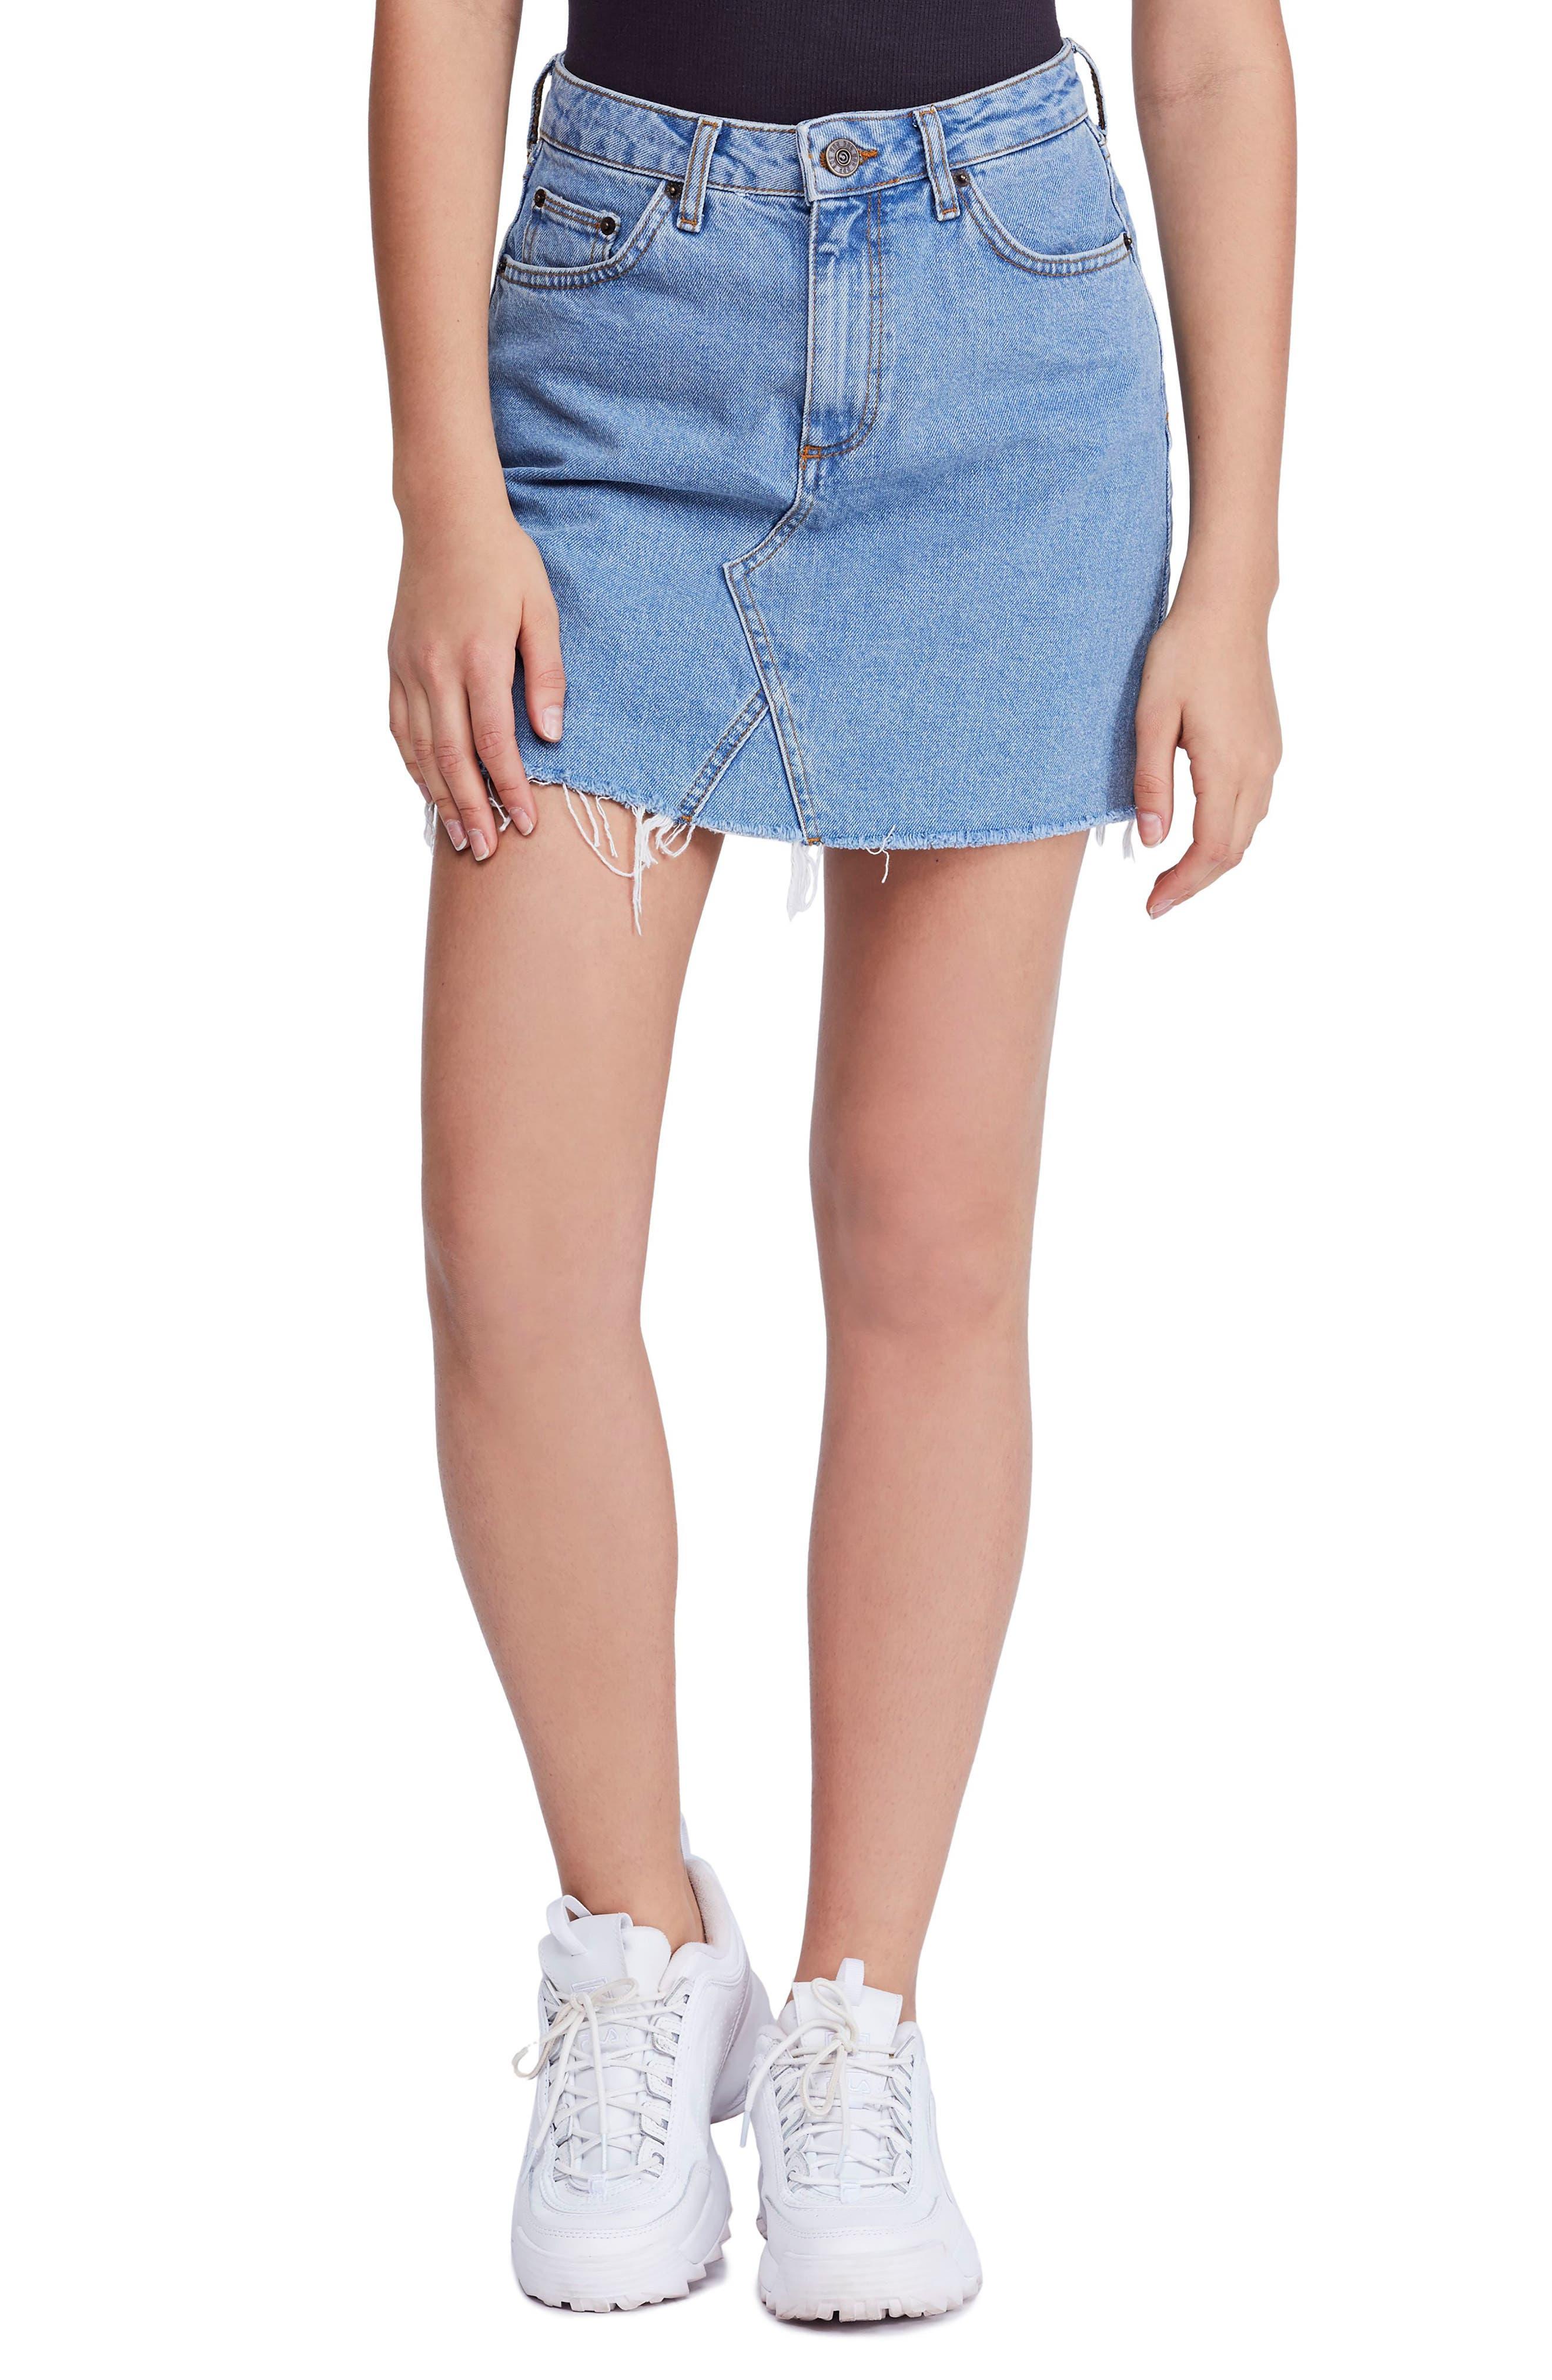 Bdg Urban Outfitters Denim Raw Edge Miniskirt, Blue